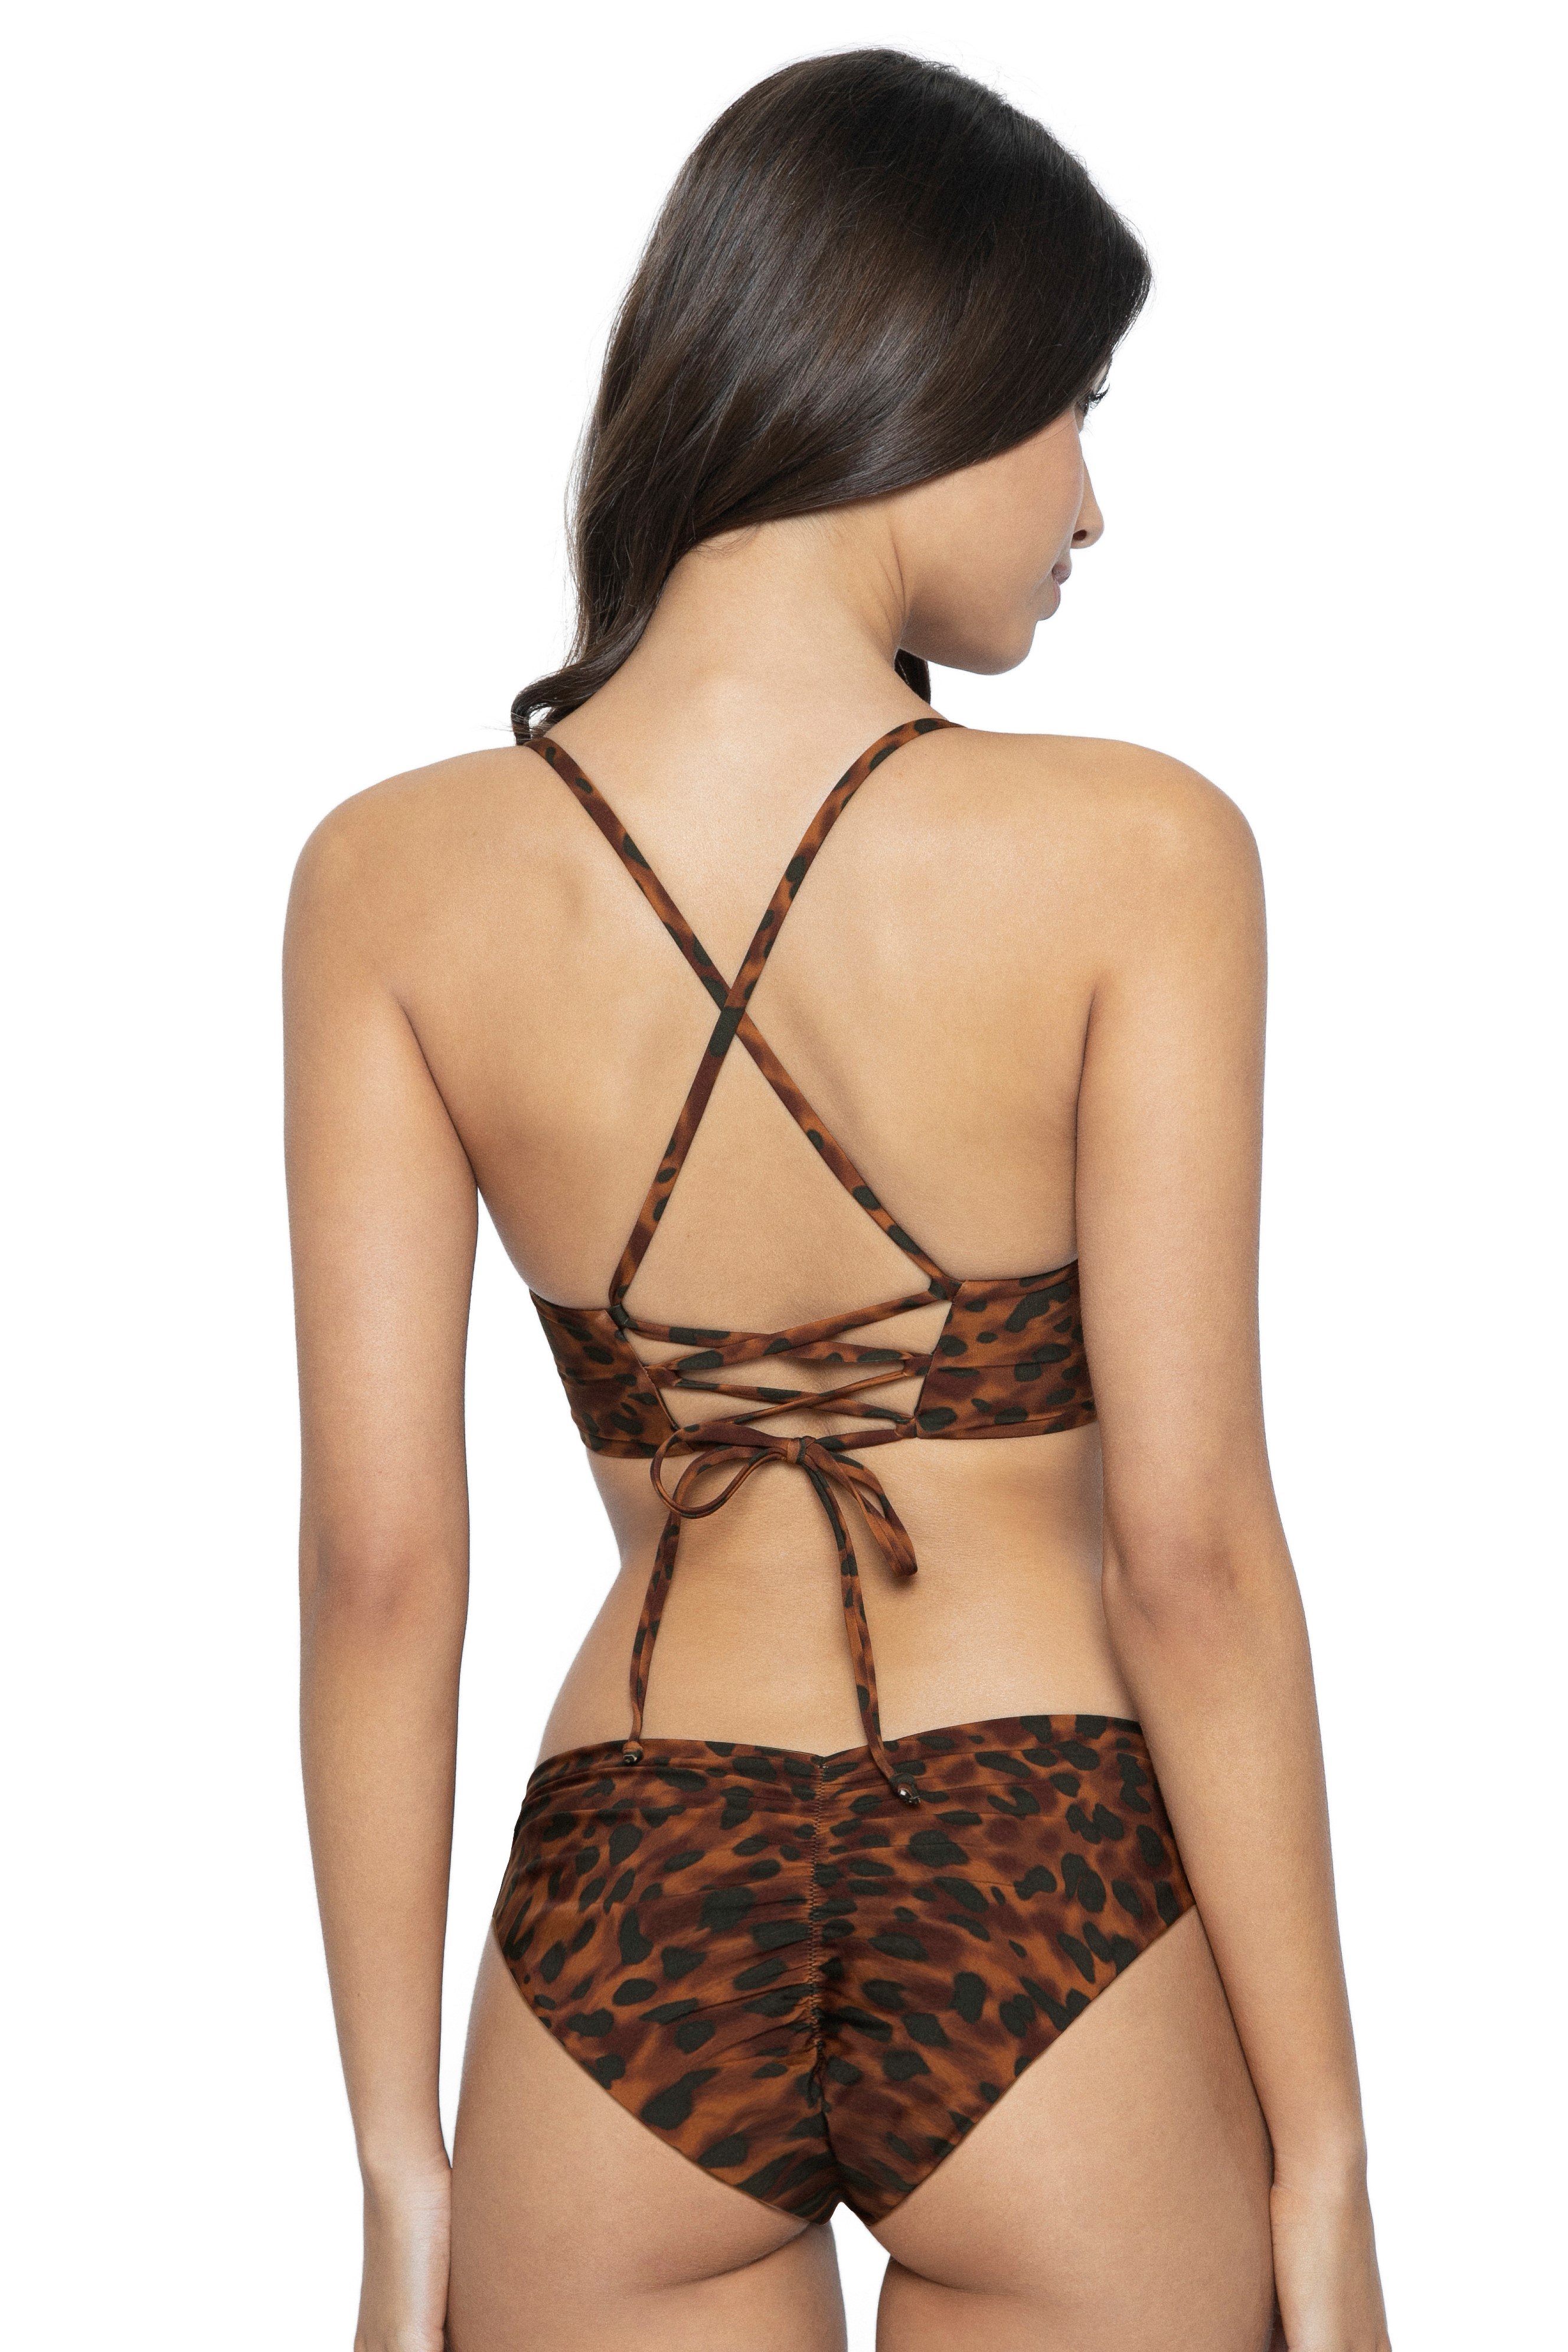 Pilyq Swim Wild Heart Corset Bralette Scrunch Bikini